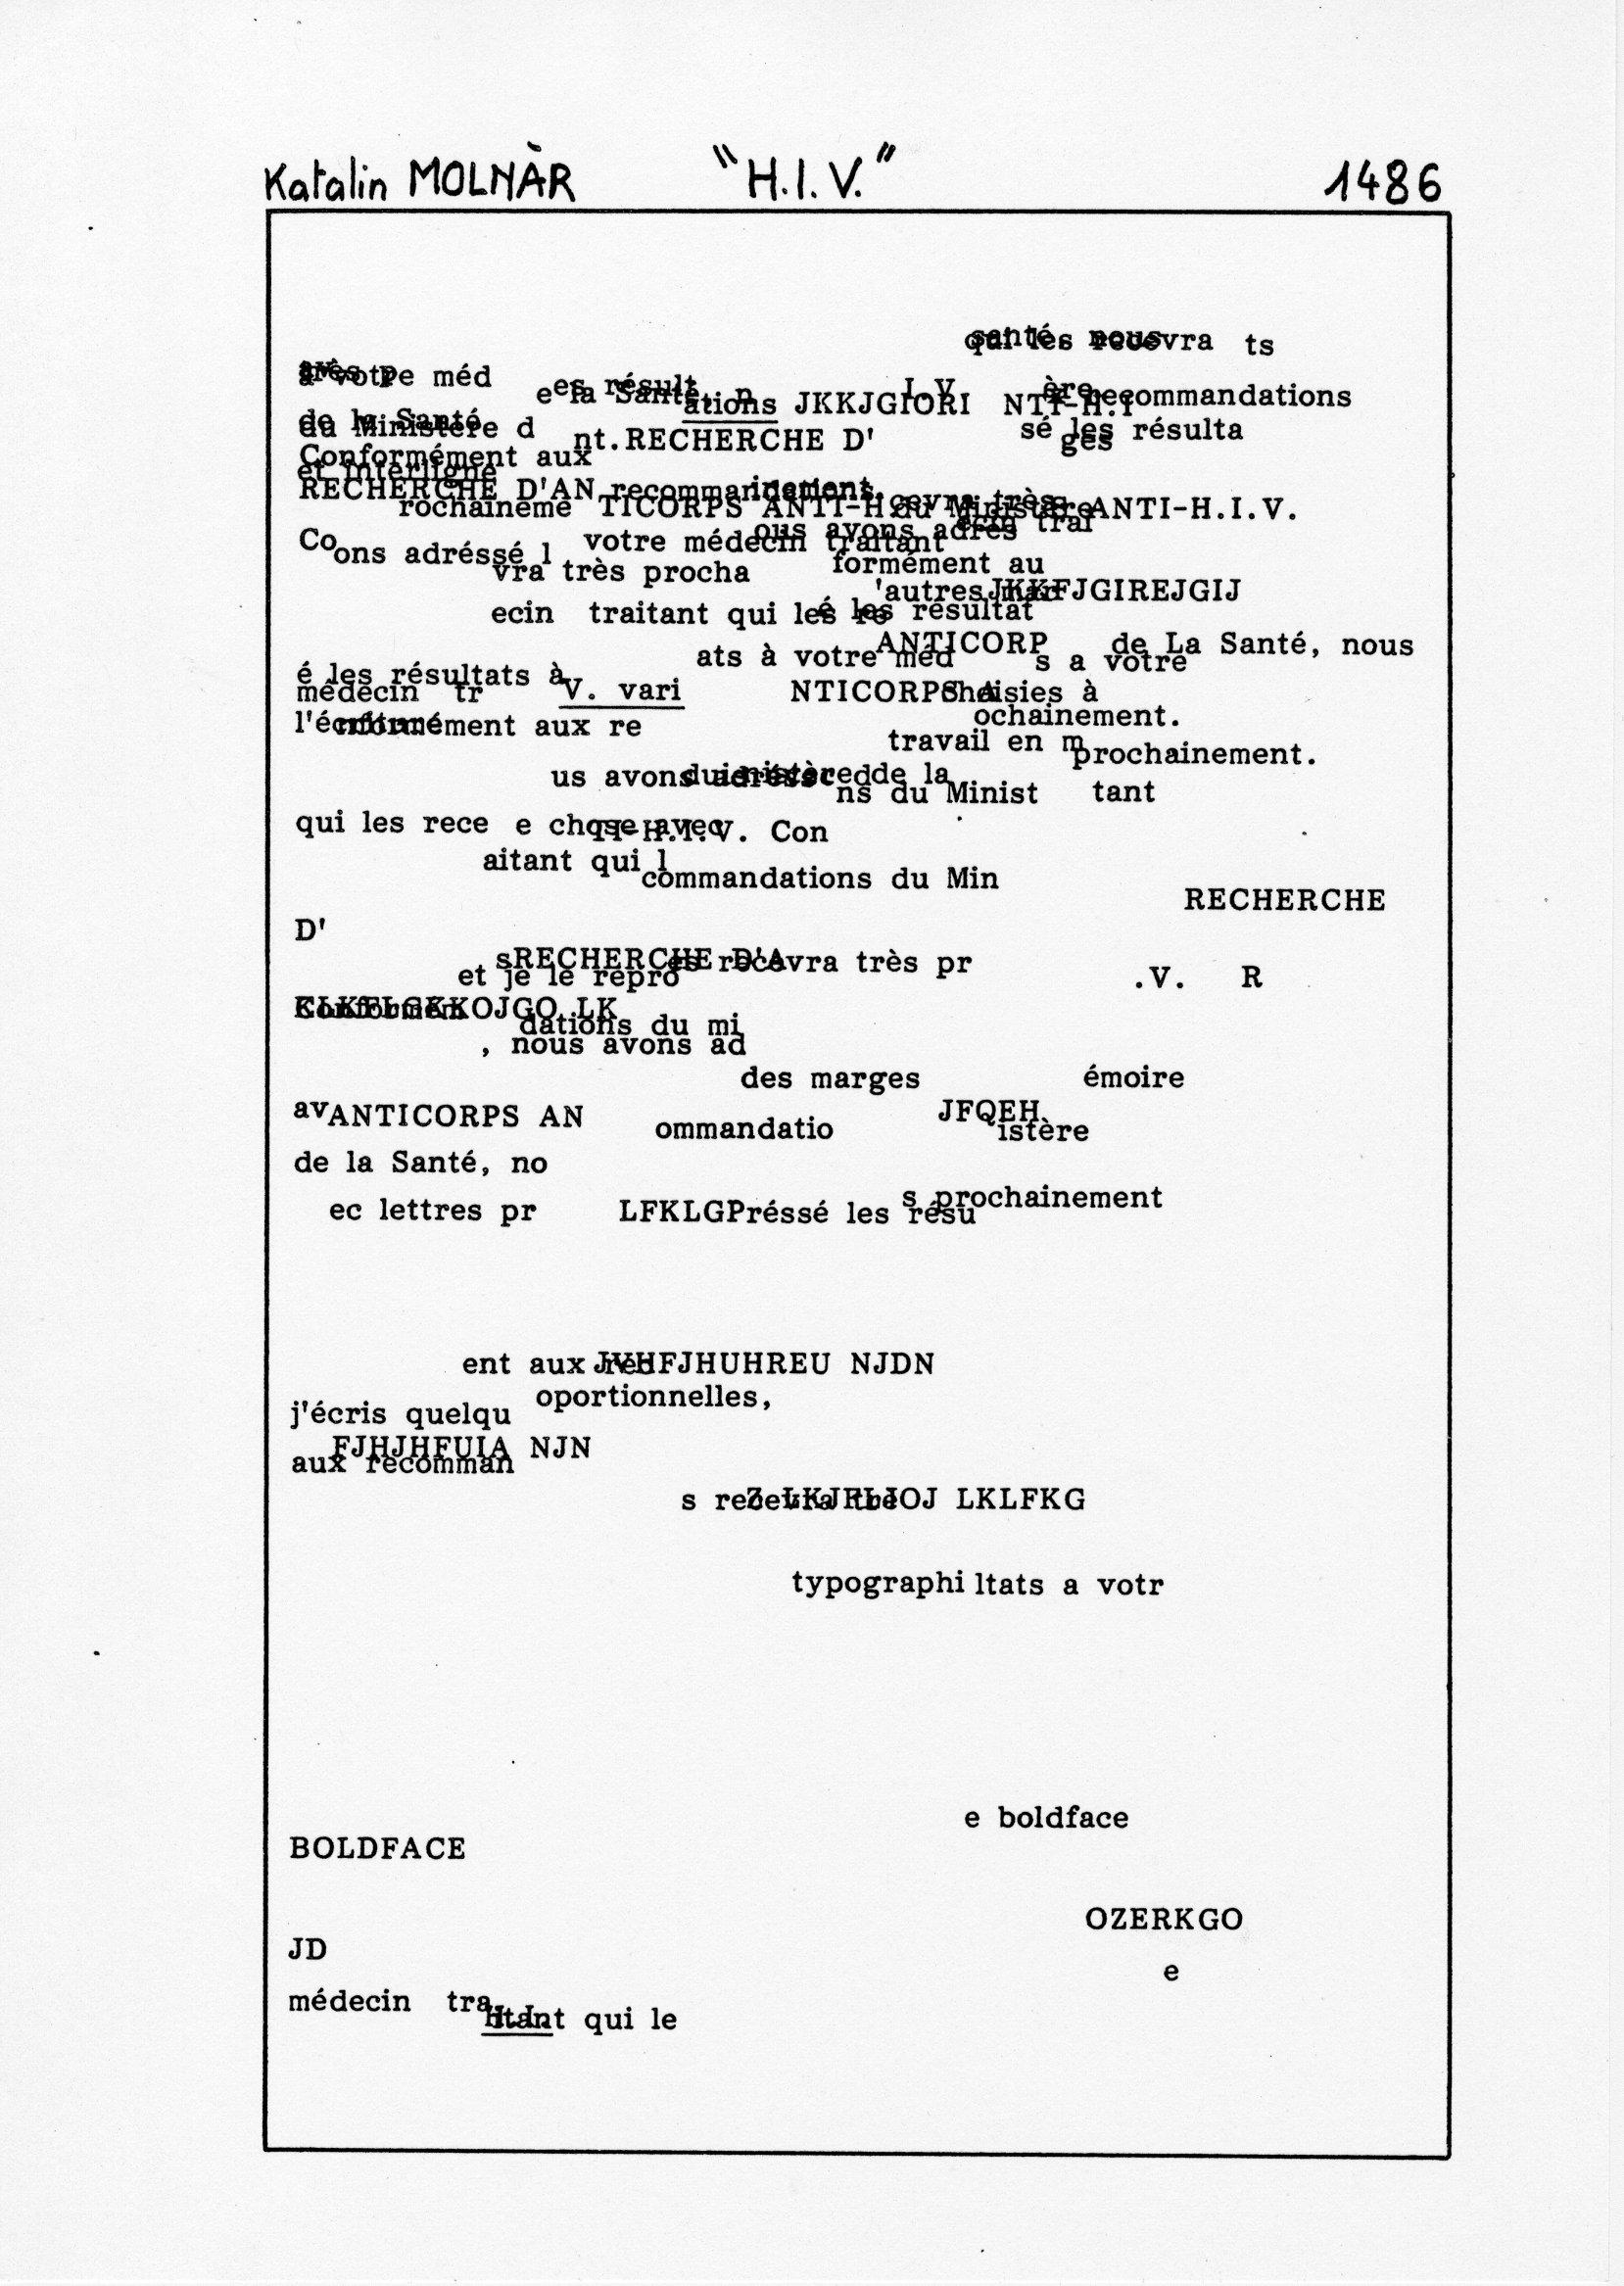 page 1486 K. Molnar H.I.V.